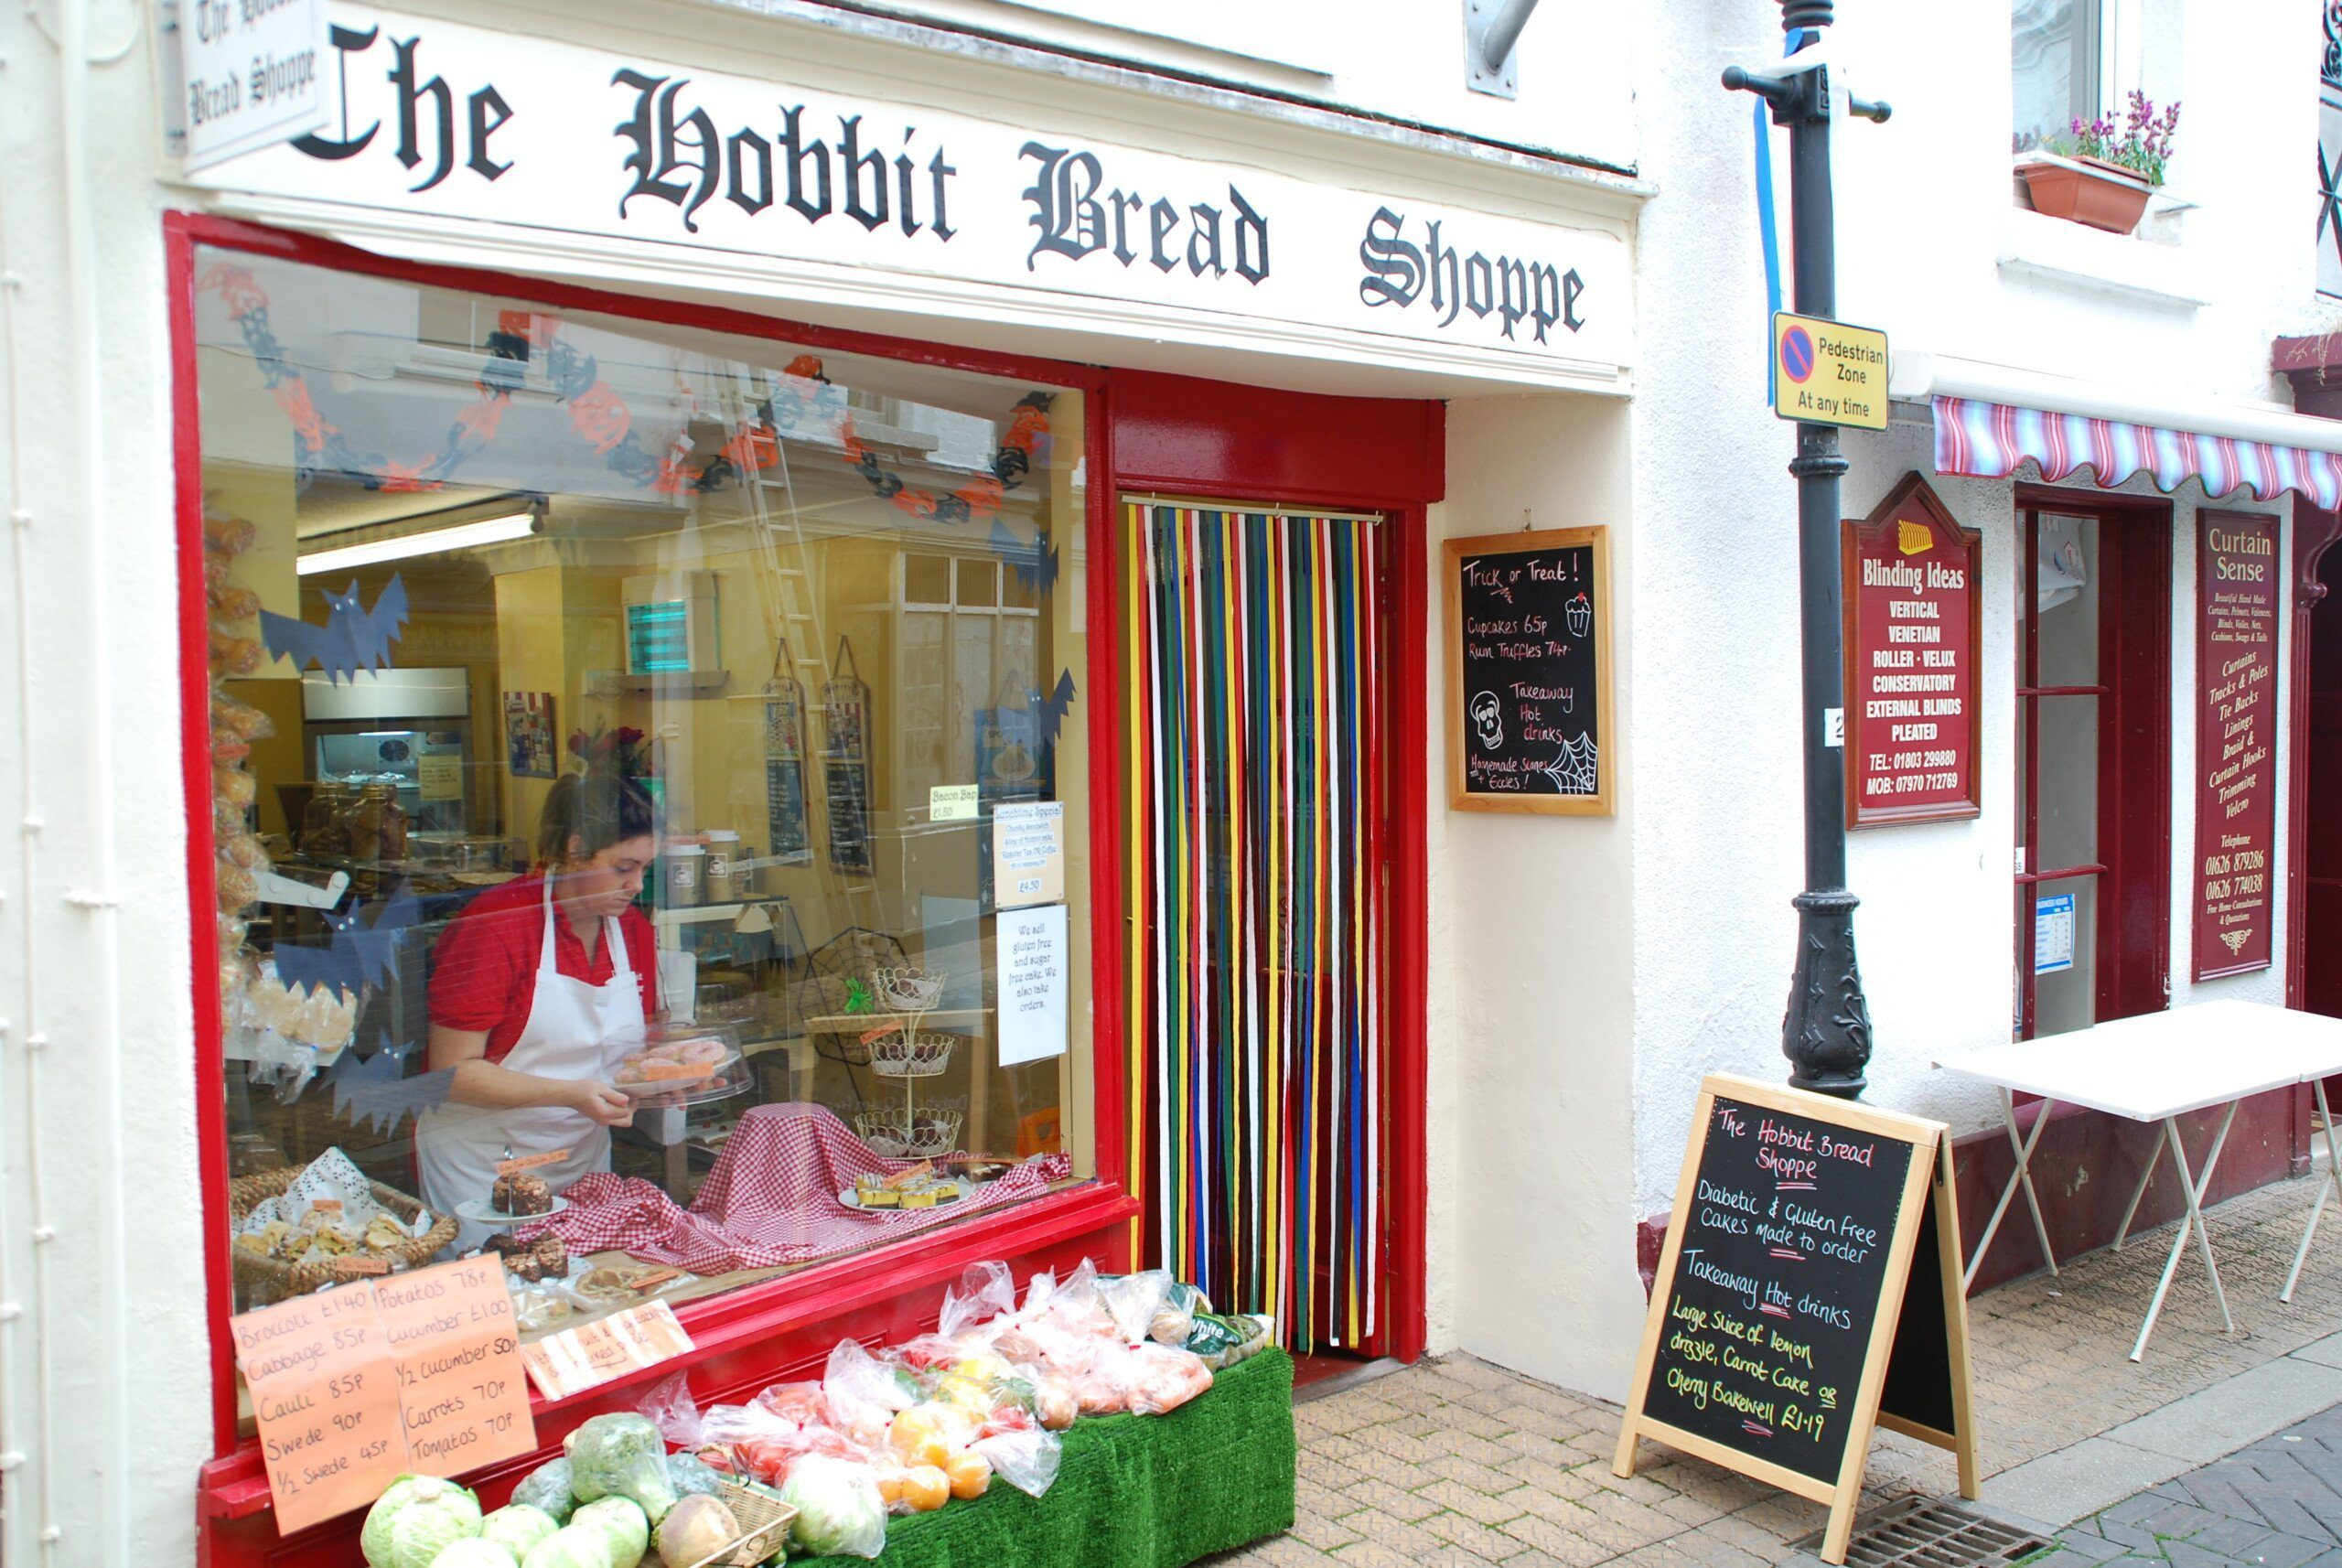 Women dressing window at Hobbit Bread Shoppe, Teignmouth